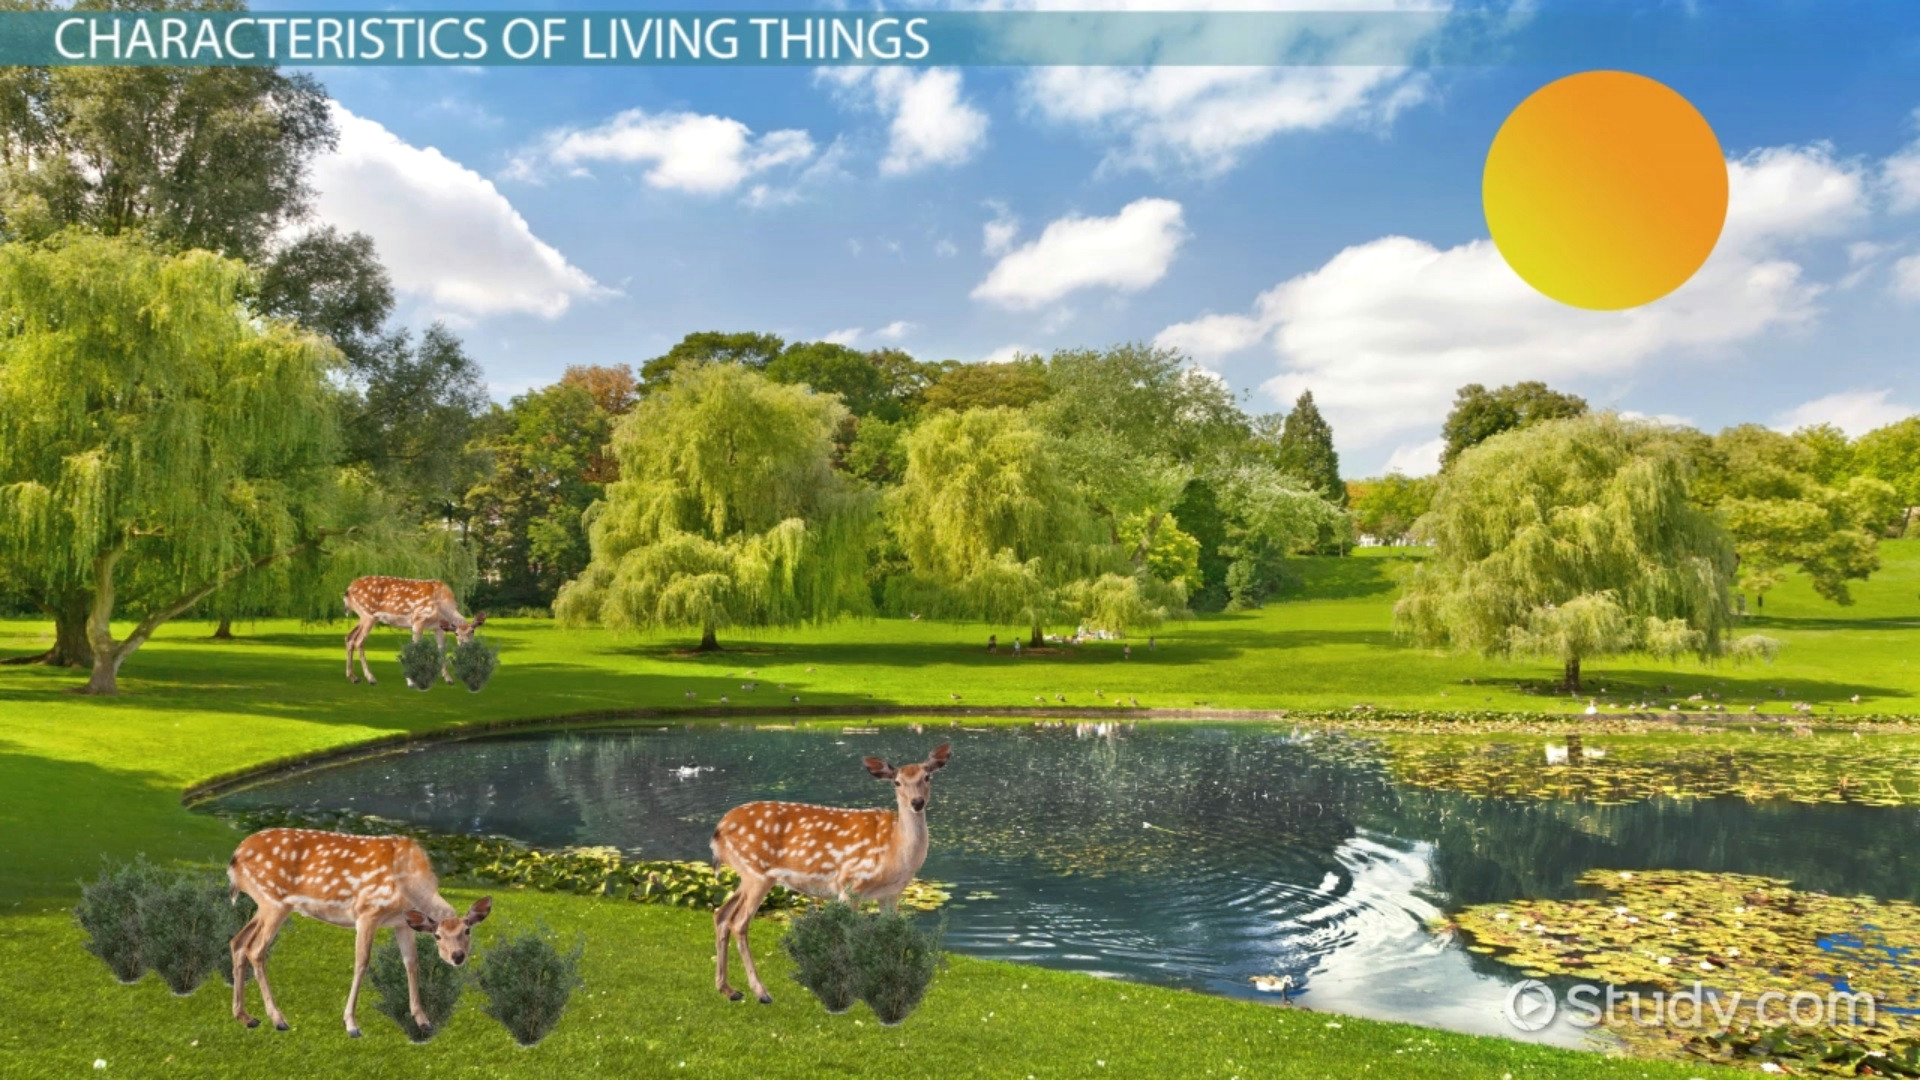 characteristics of living things thumbnail 175311 jpg